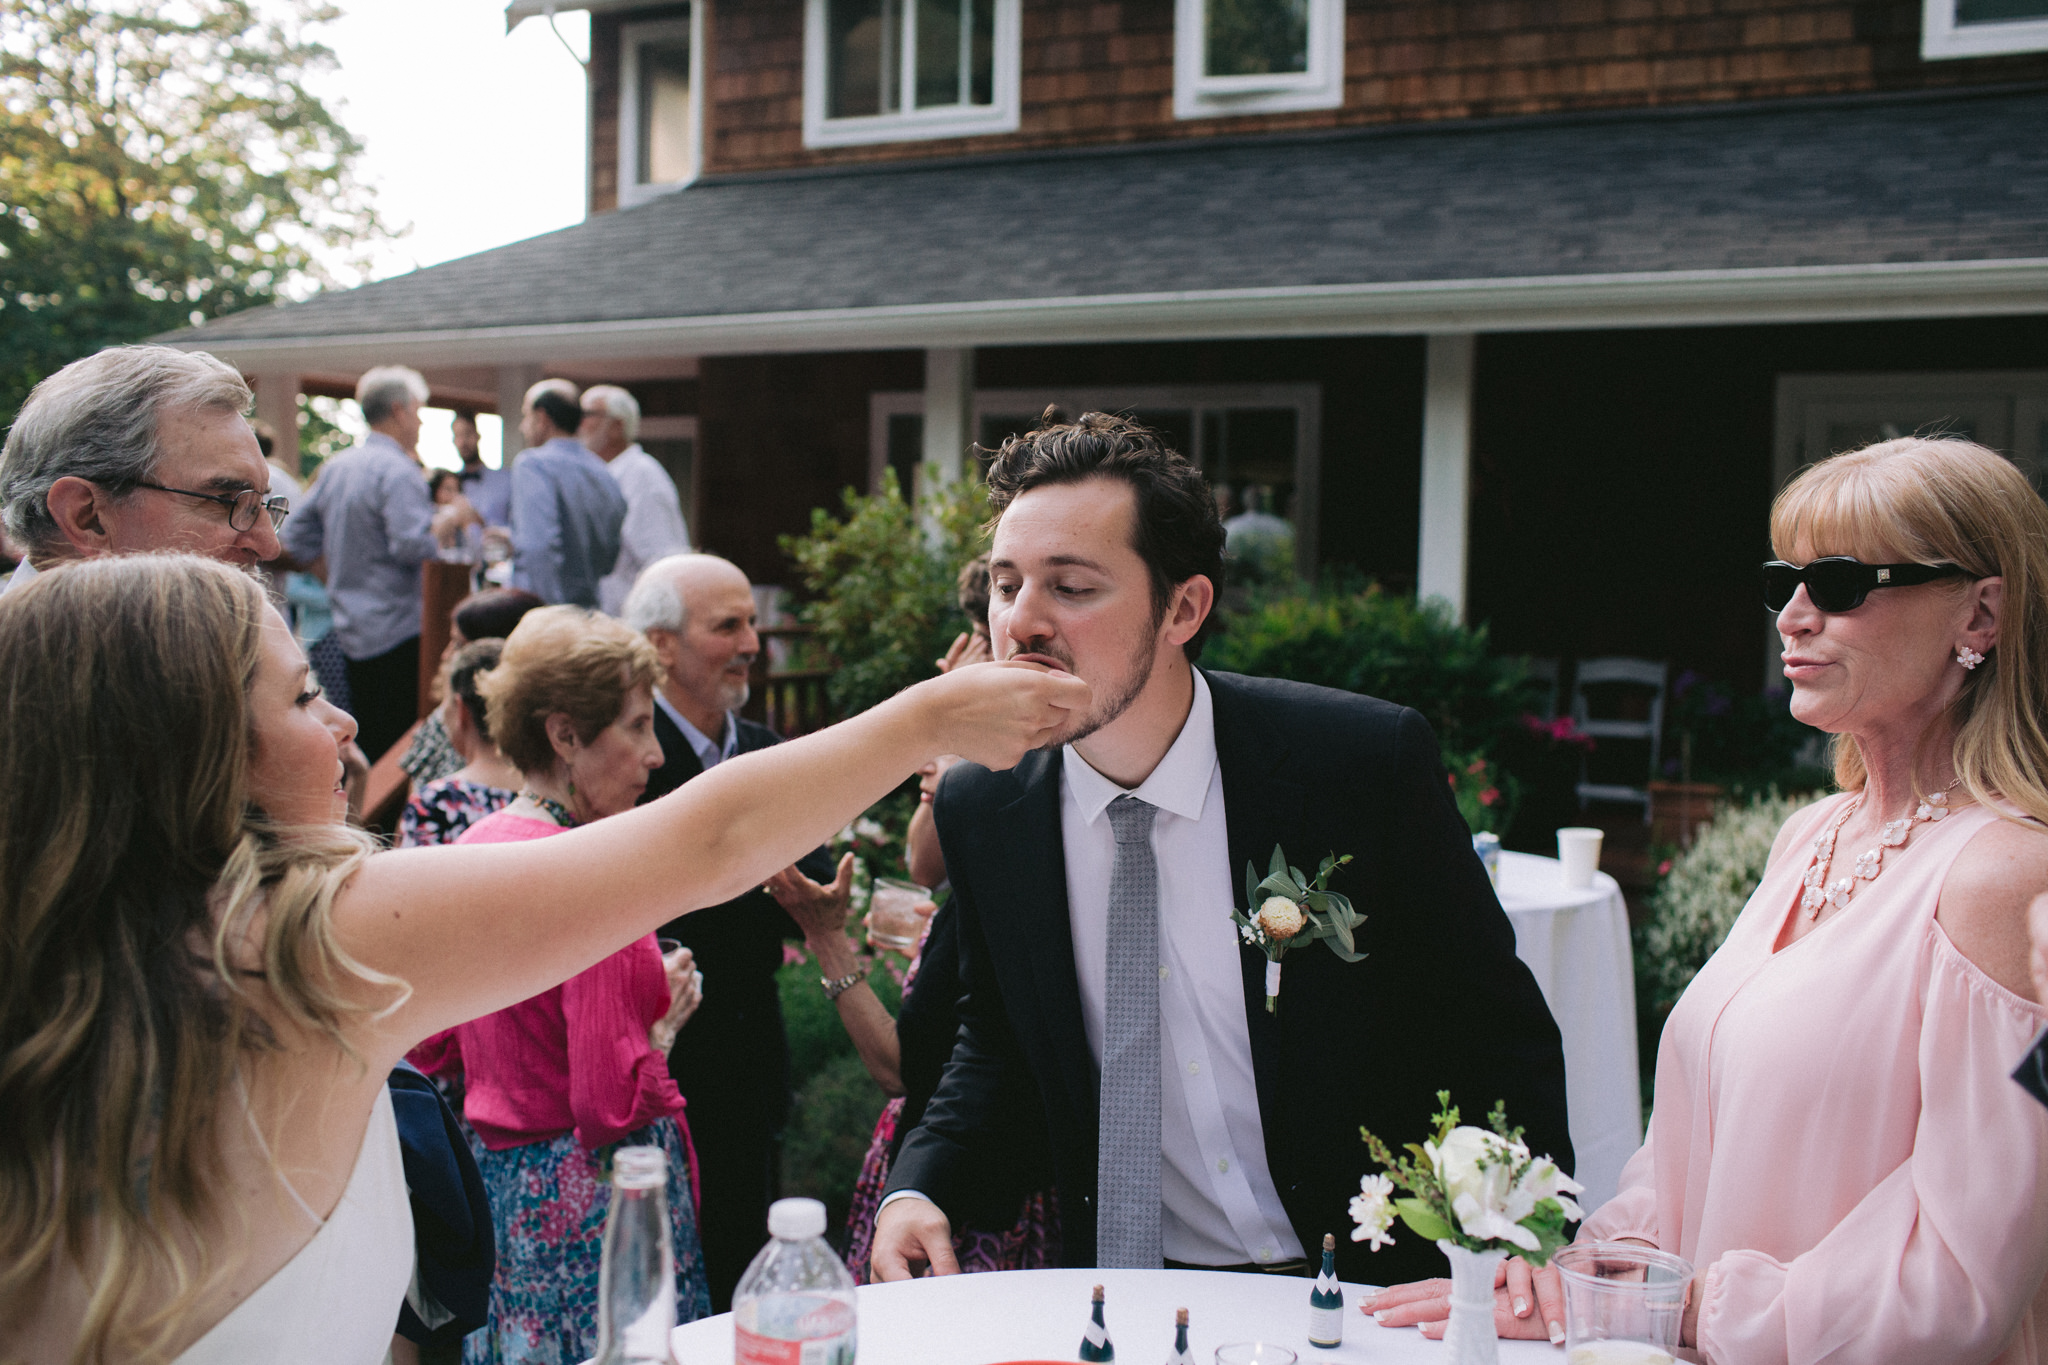 Backyard-Bainbridge-Island-Wedding-Alycia-Lovell-Photography-162.JPG